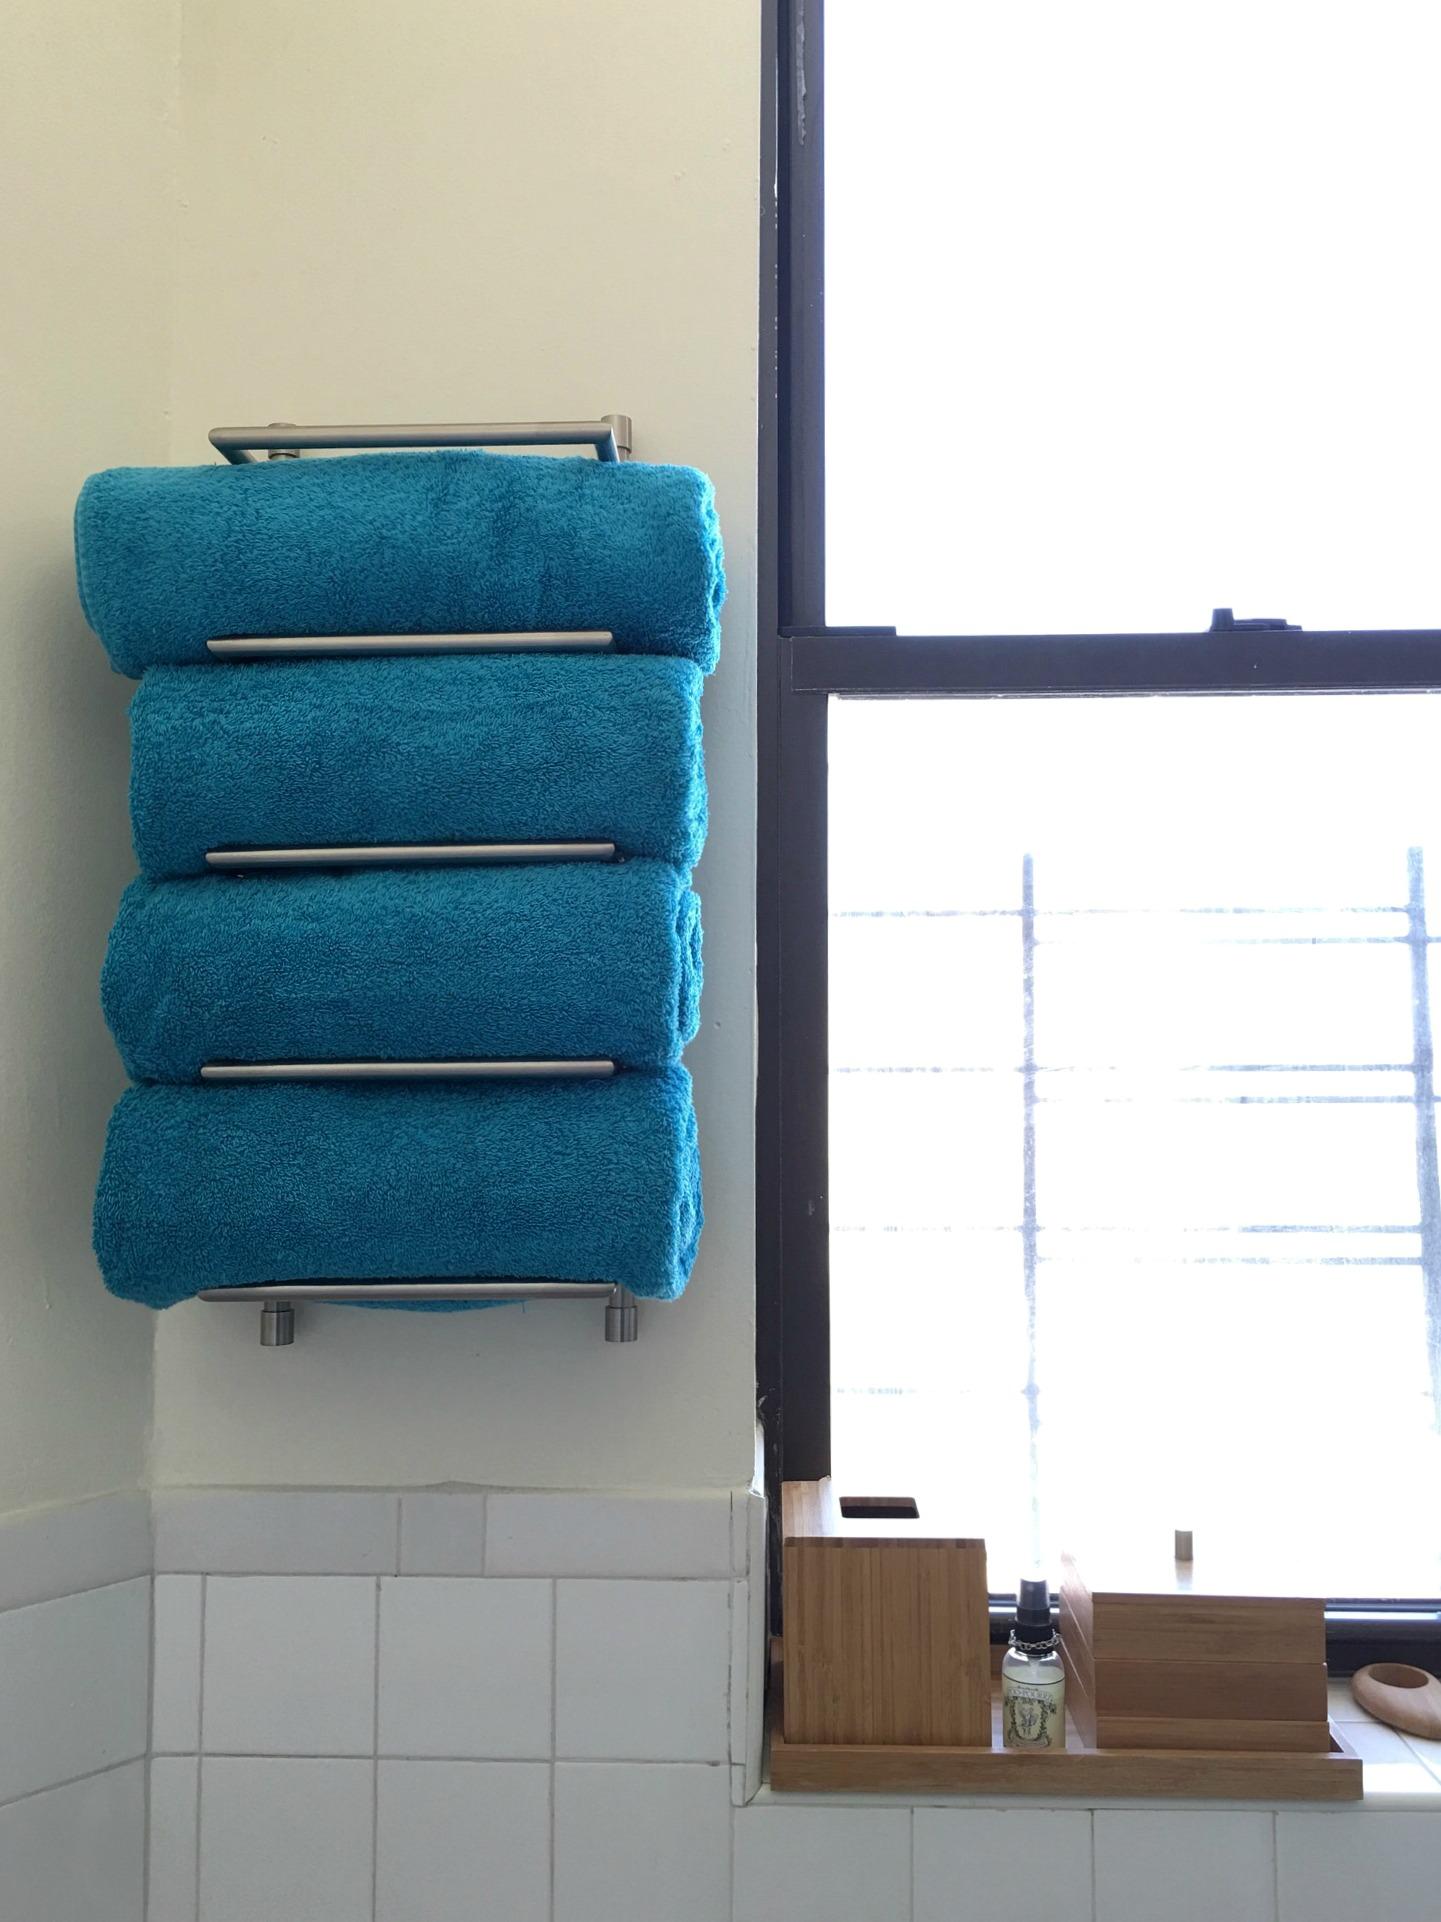 small bathroom hack - towel rack